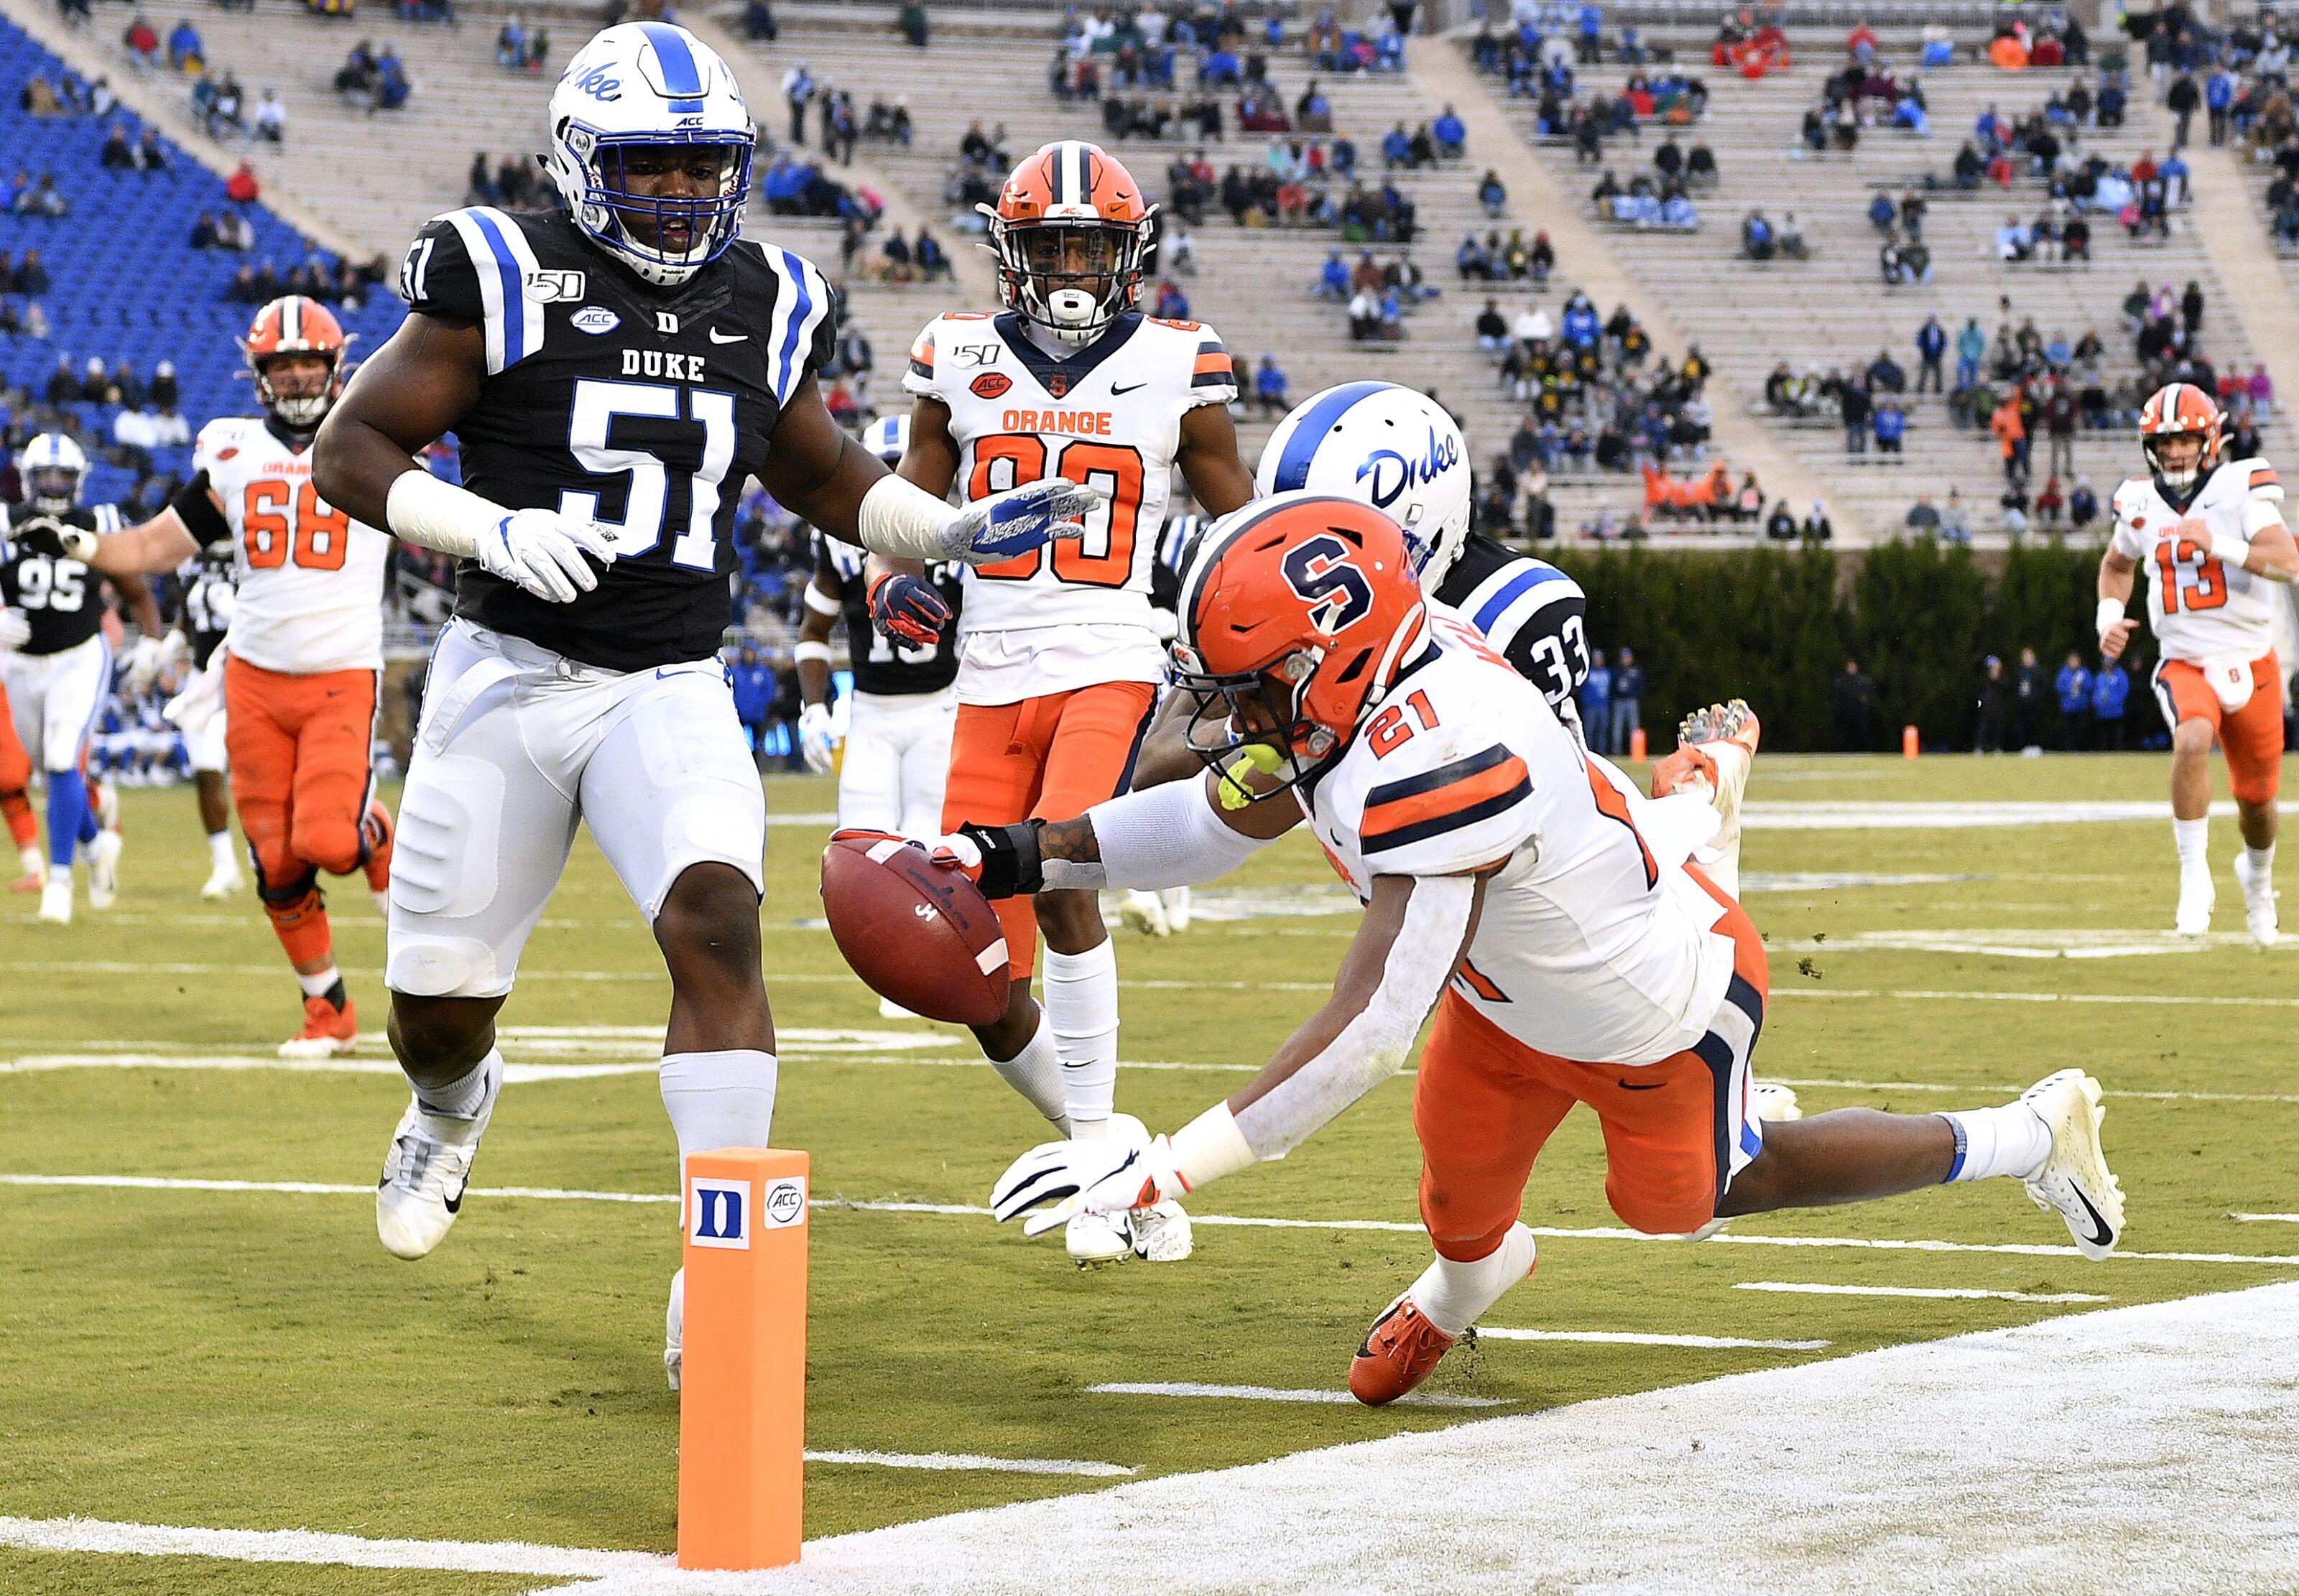 Syracuse Football: Orange come alive with splash plays in huge Duke win